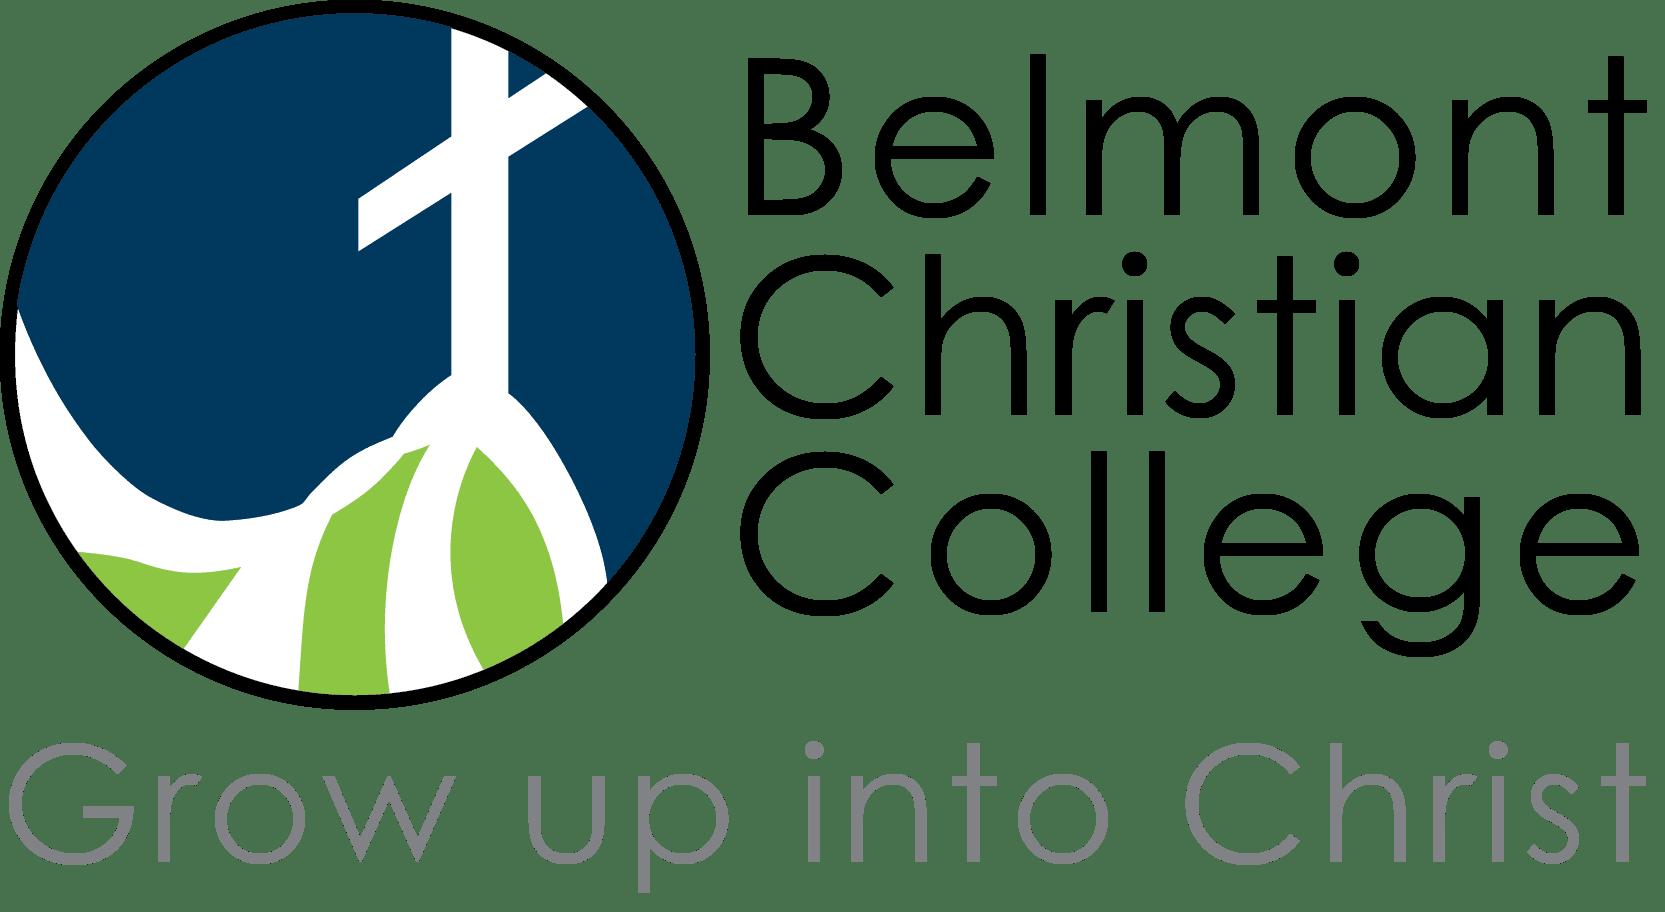 Belmont Christian College logo